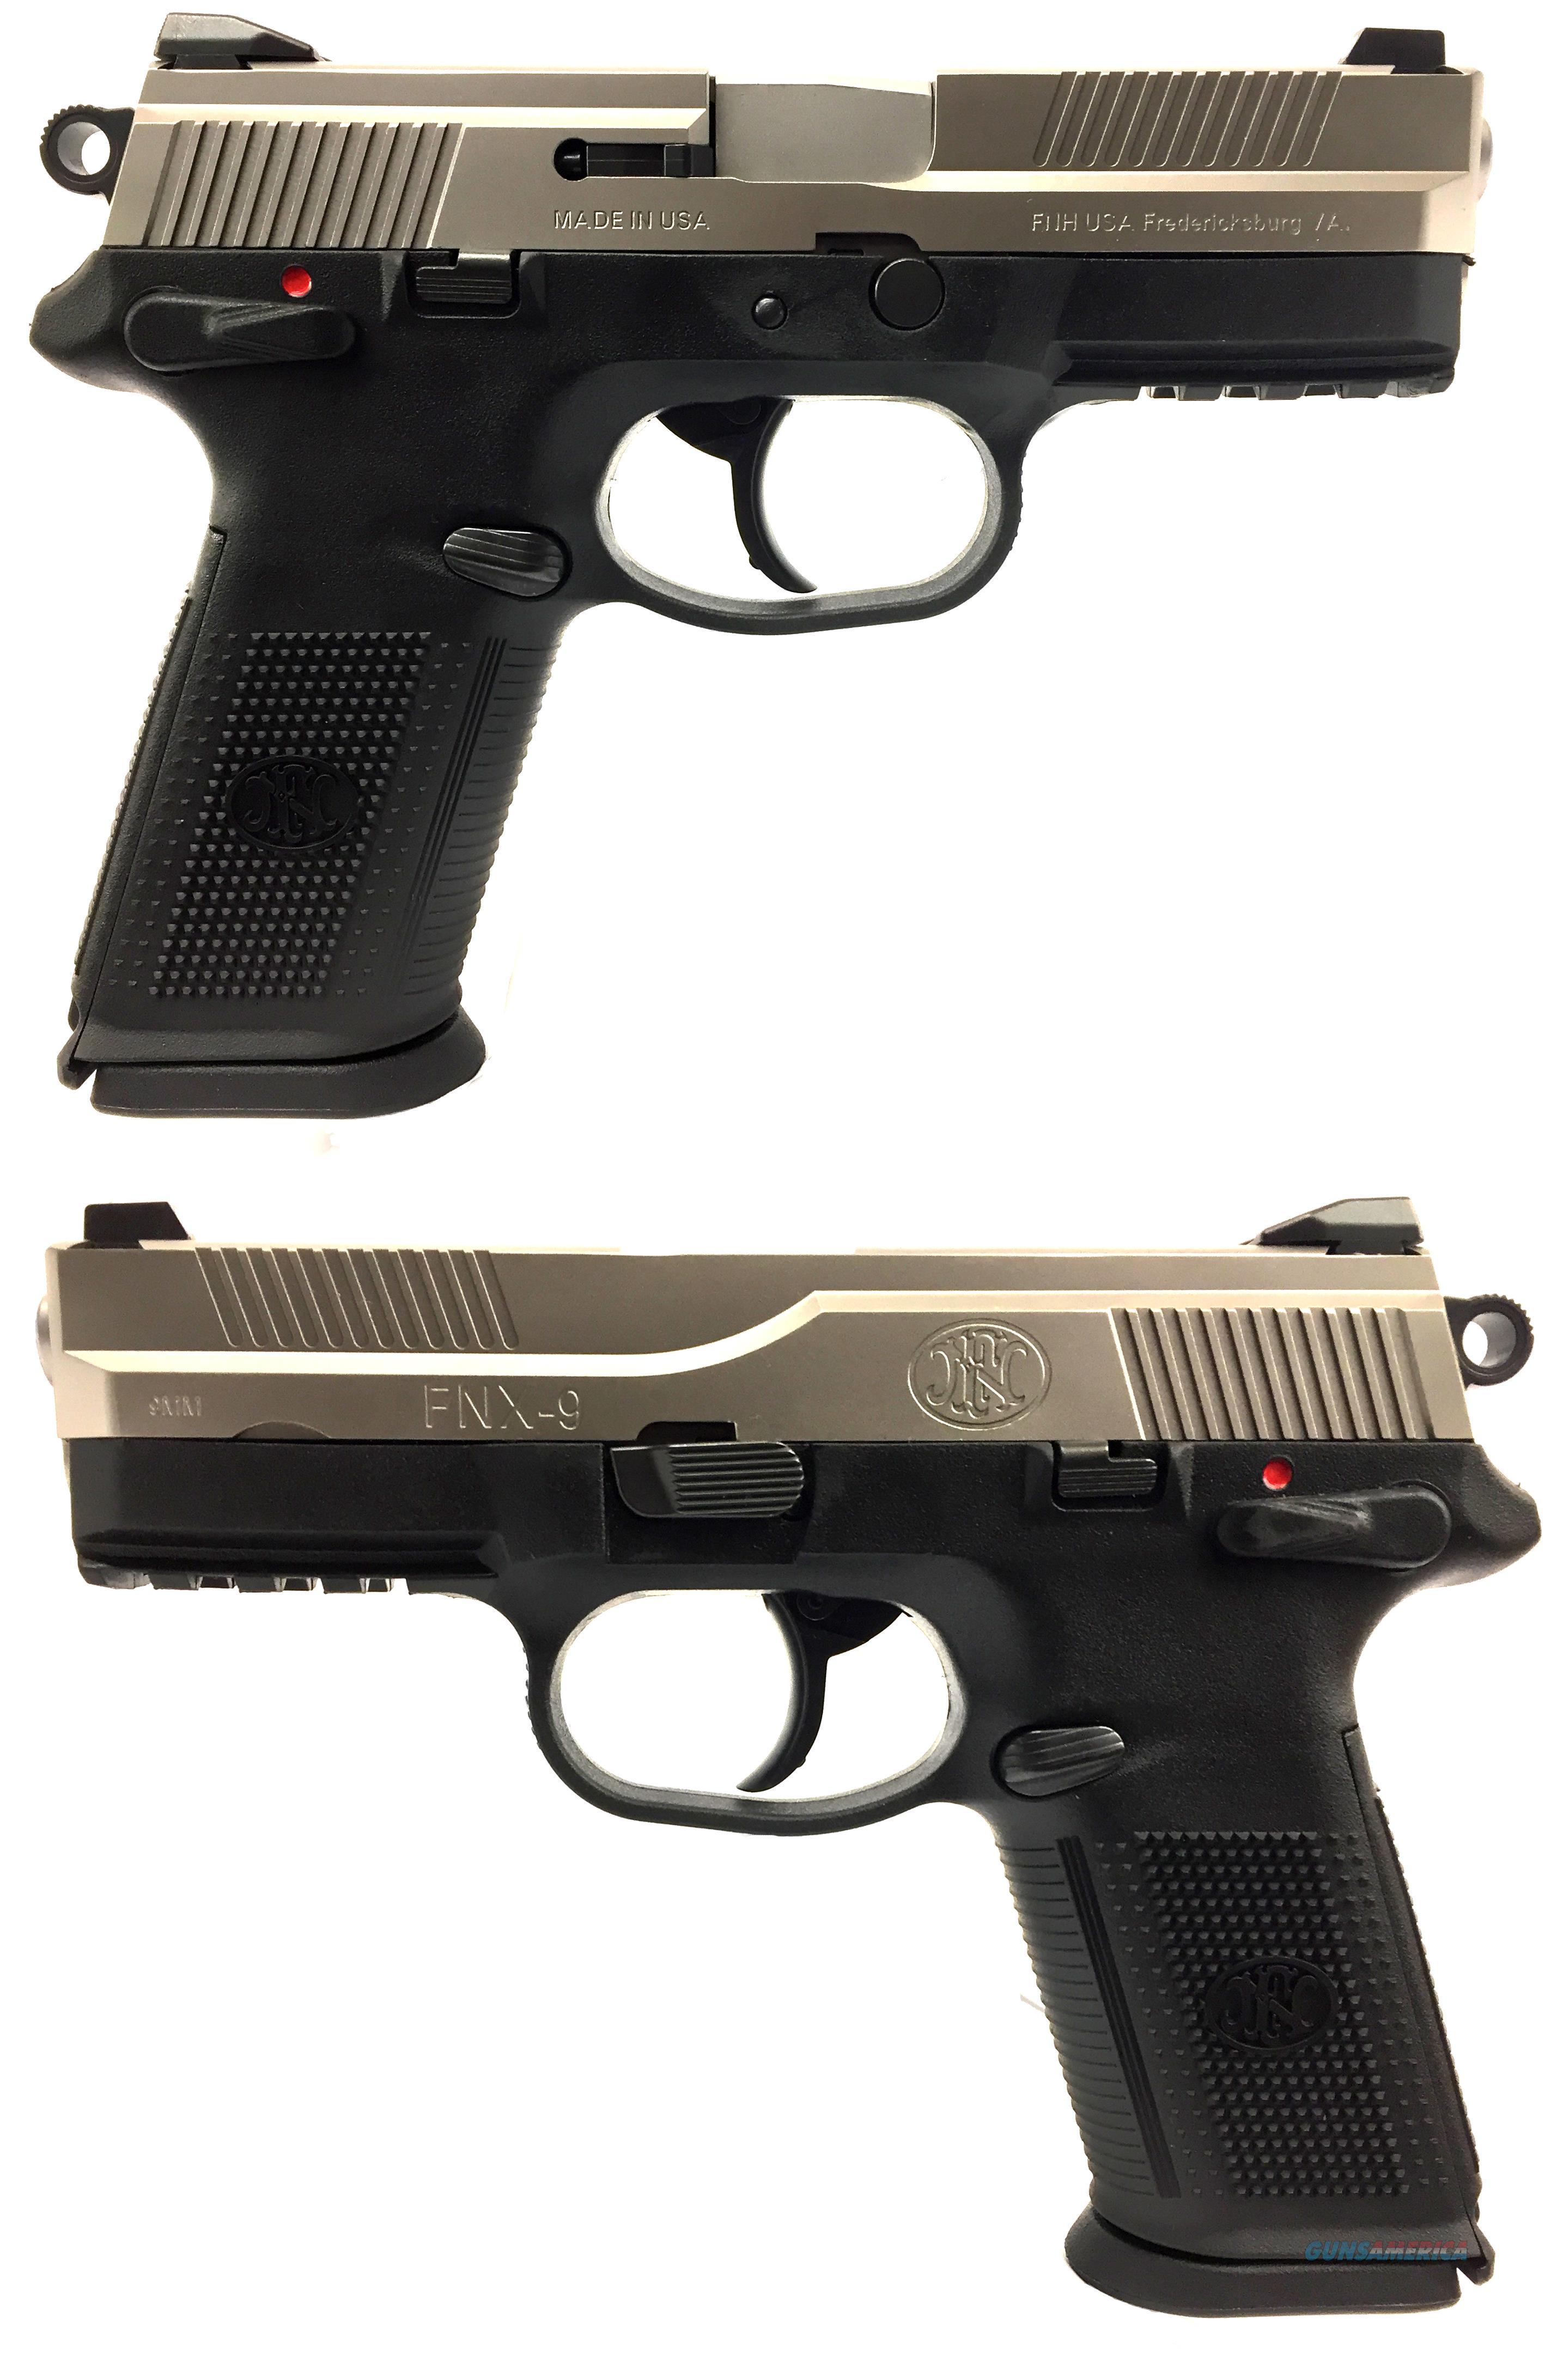 FNH FNX-9 w/ Stainless Steel Slide  Guns > Pistols > FNH - Fabrique Nationale (FN) Pistols > FNX